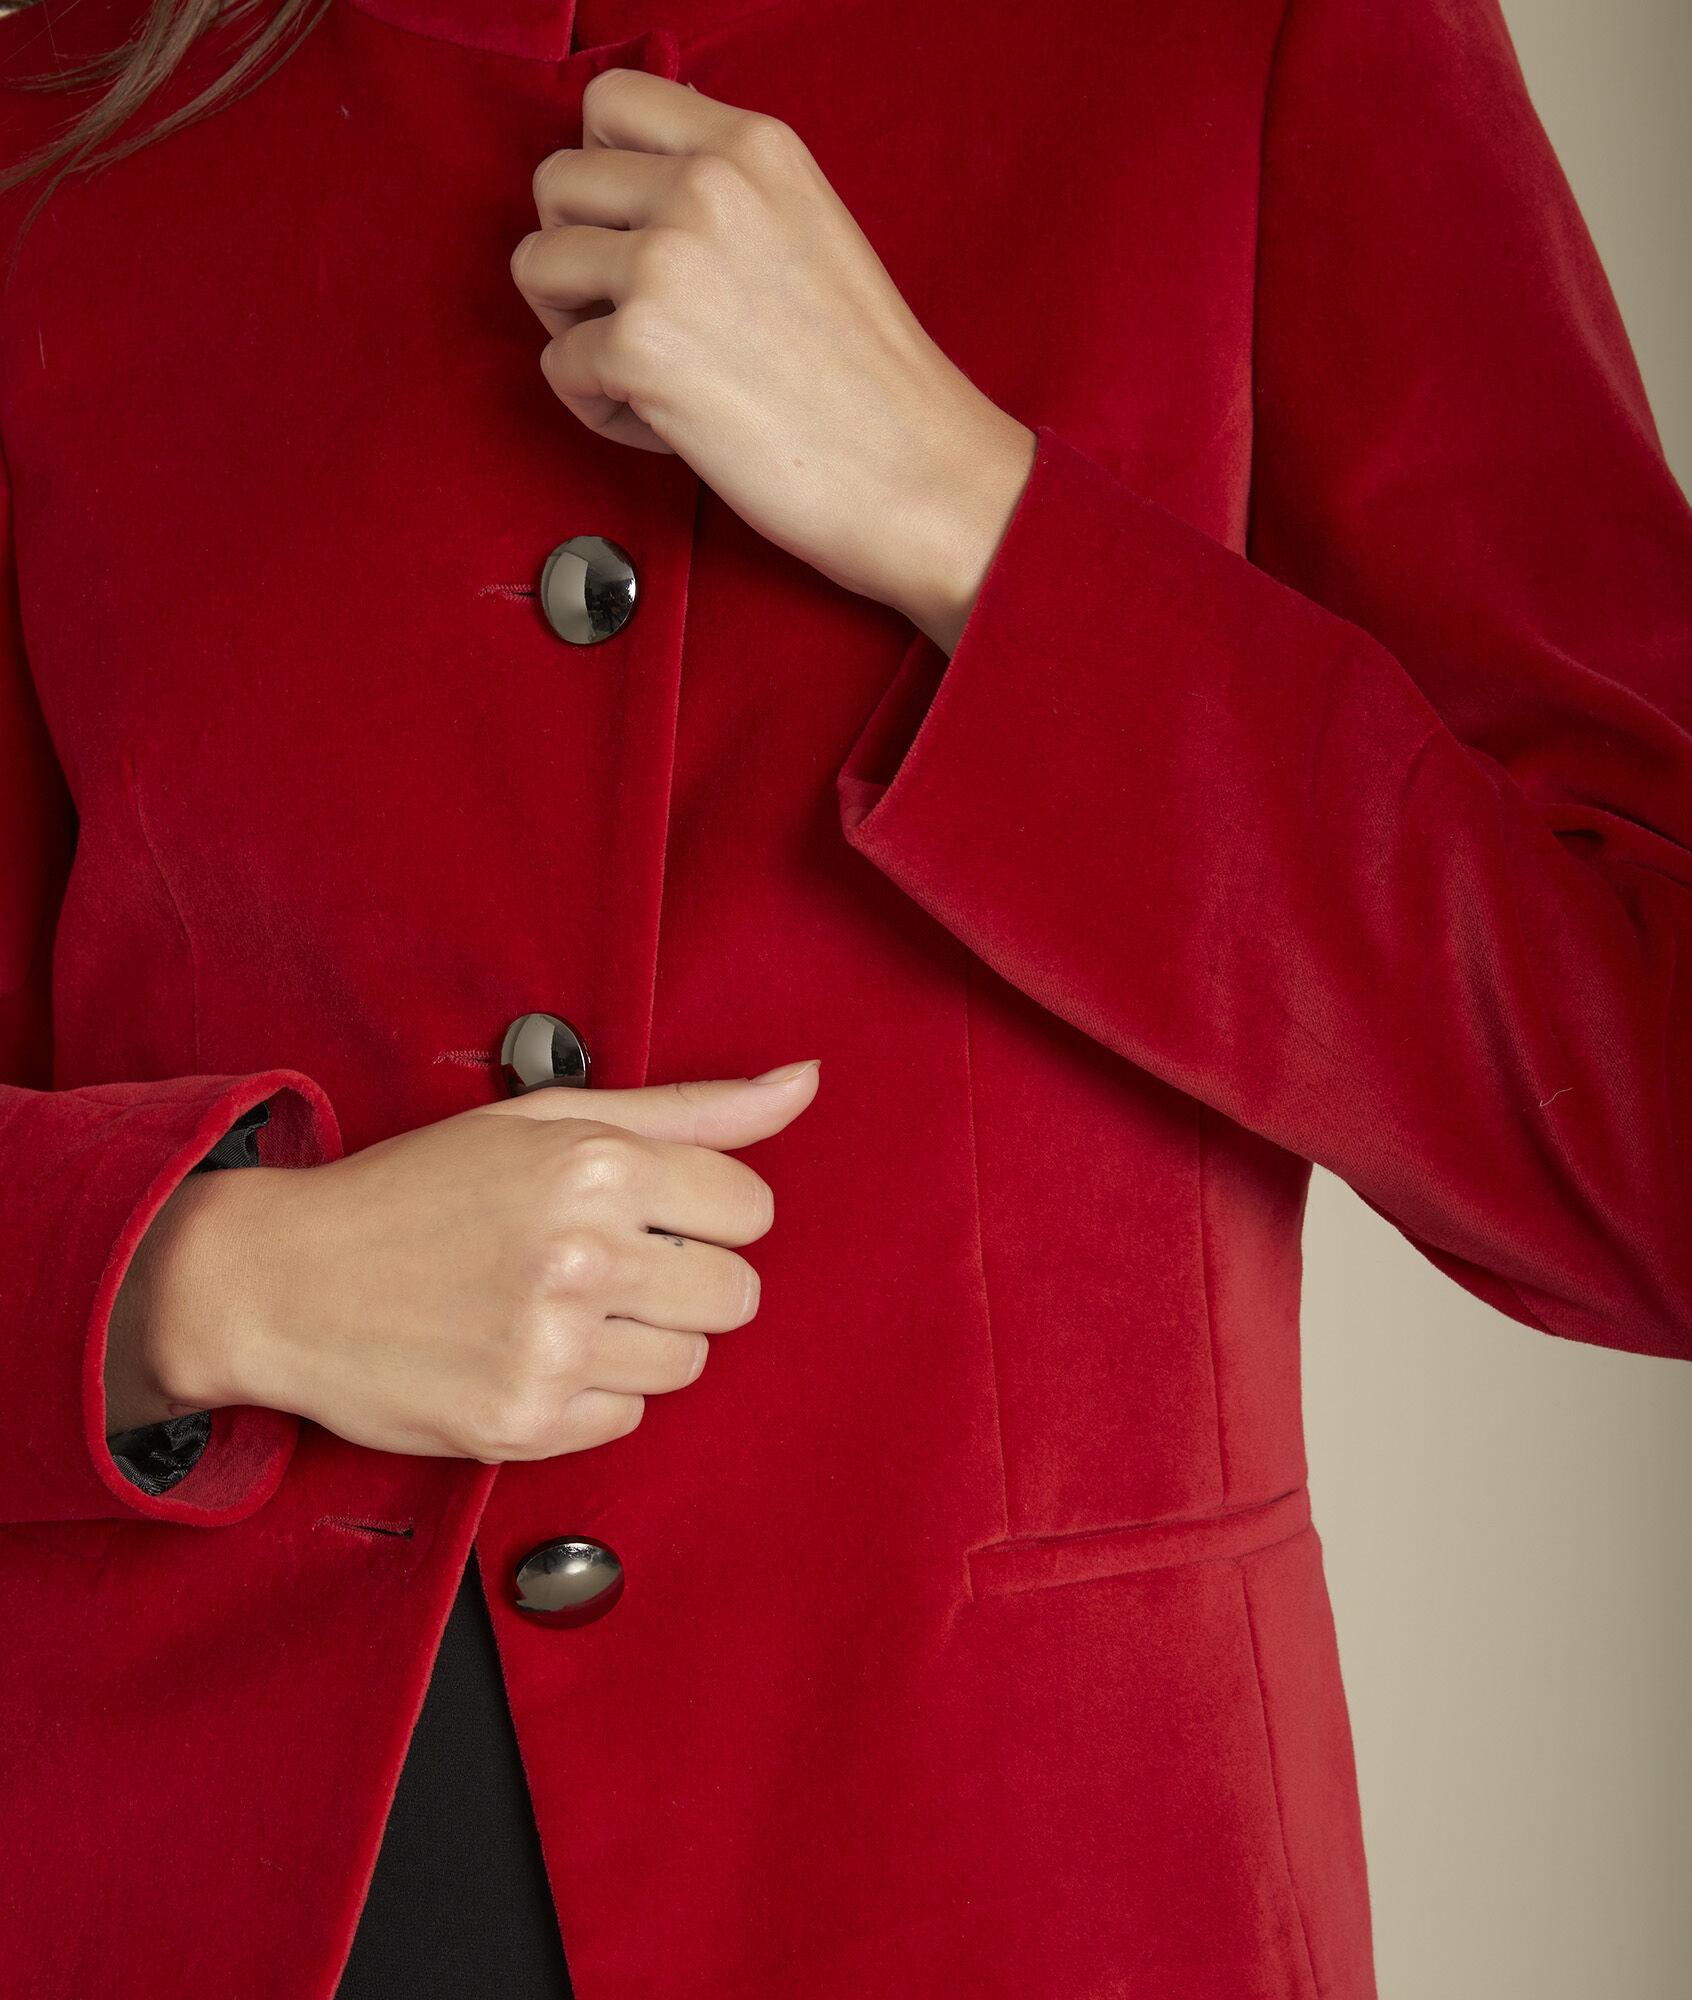 Rote Aus 123 DamenMaison Jacke Samt Bergame vNwPym0O8n